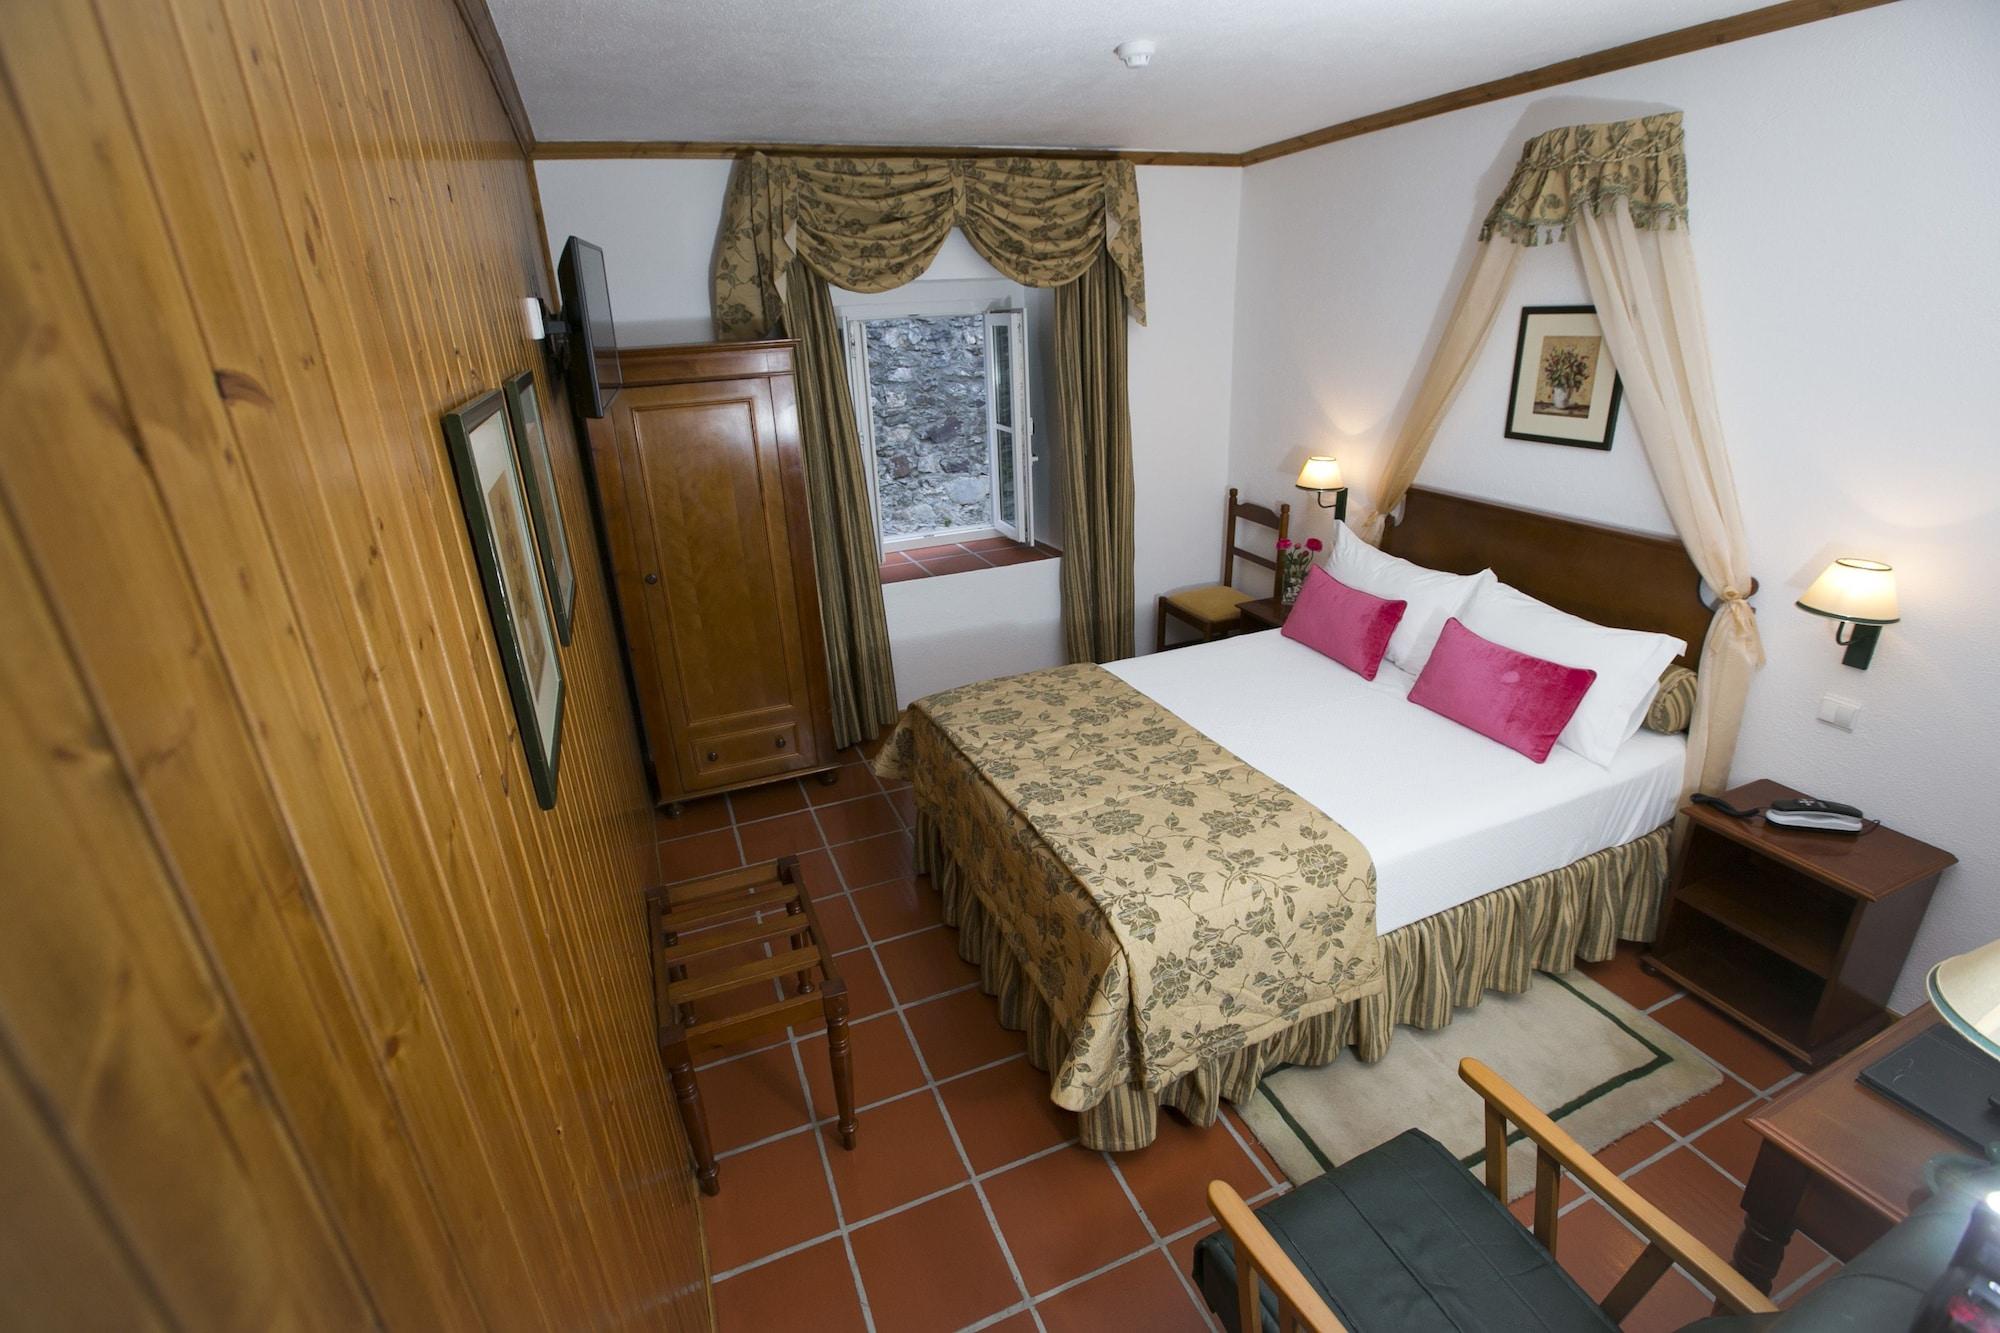 Hotel El-Rei Dom Manuel, Marvão